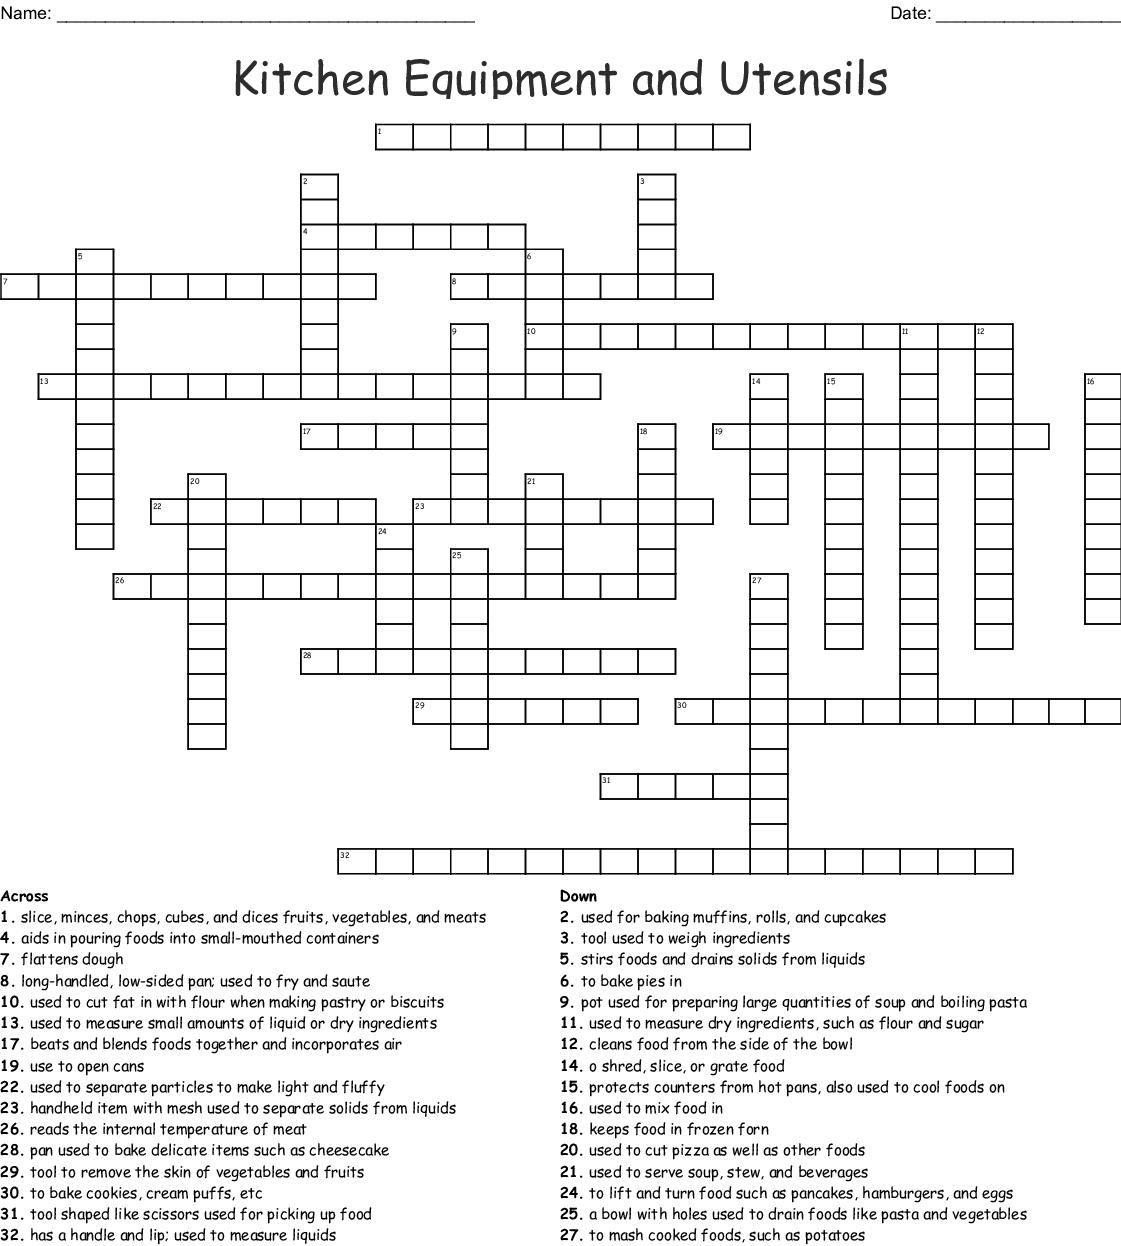 Some Kitchen Utensils Crossword